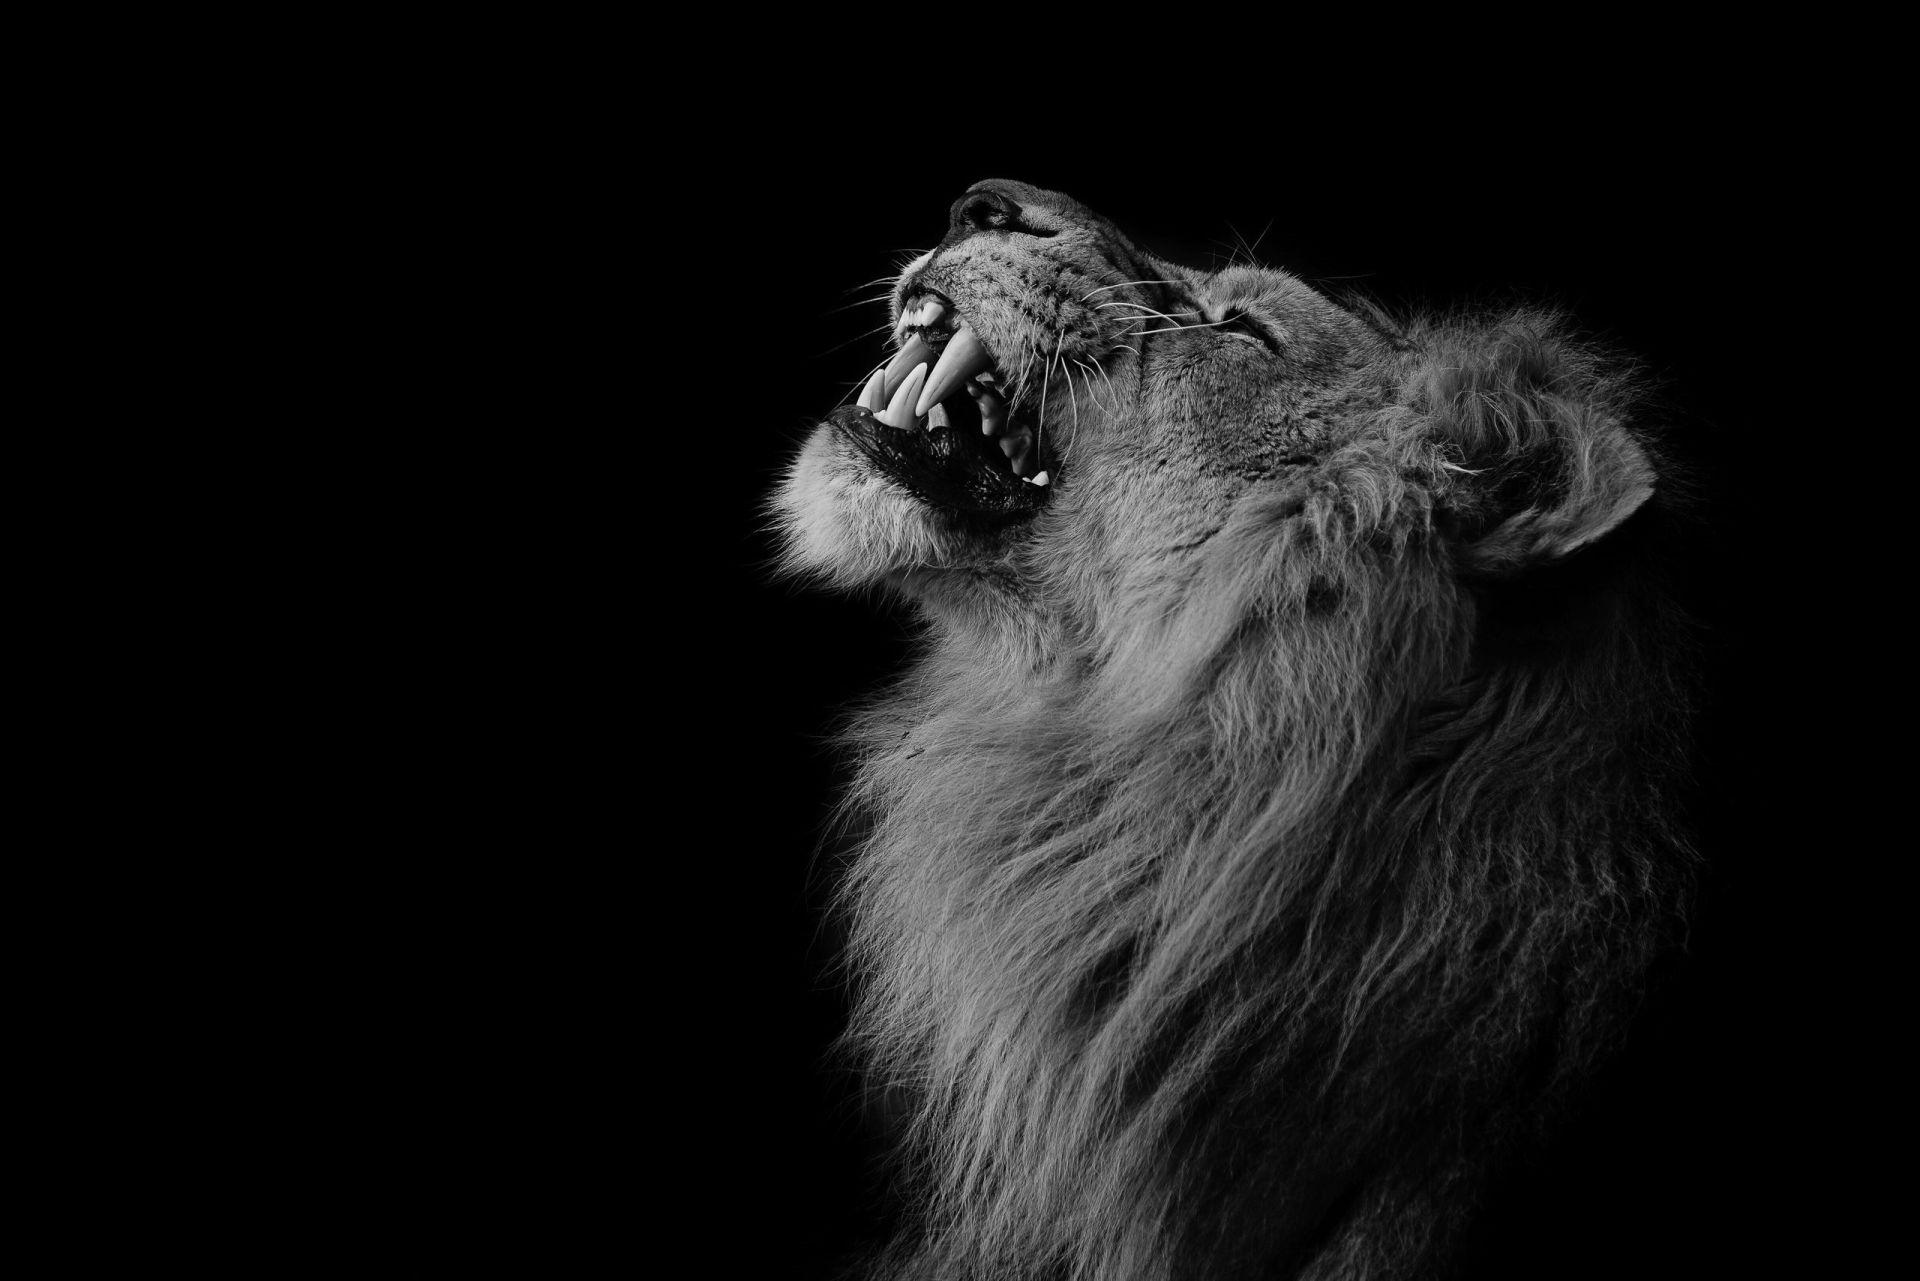 Lion Black And White Animal wallpaper photo full hd